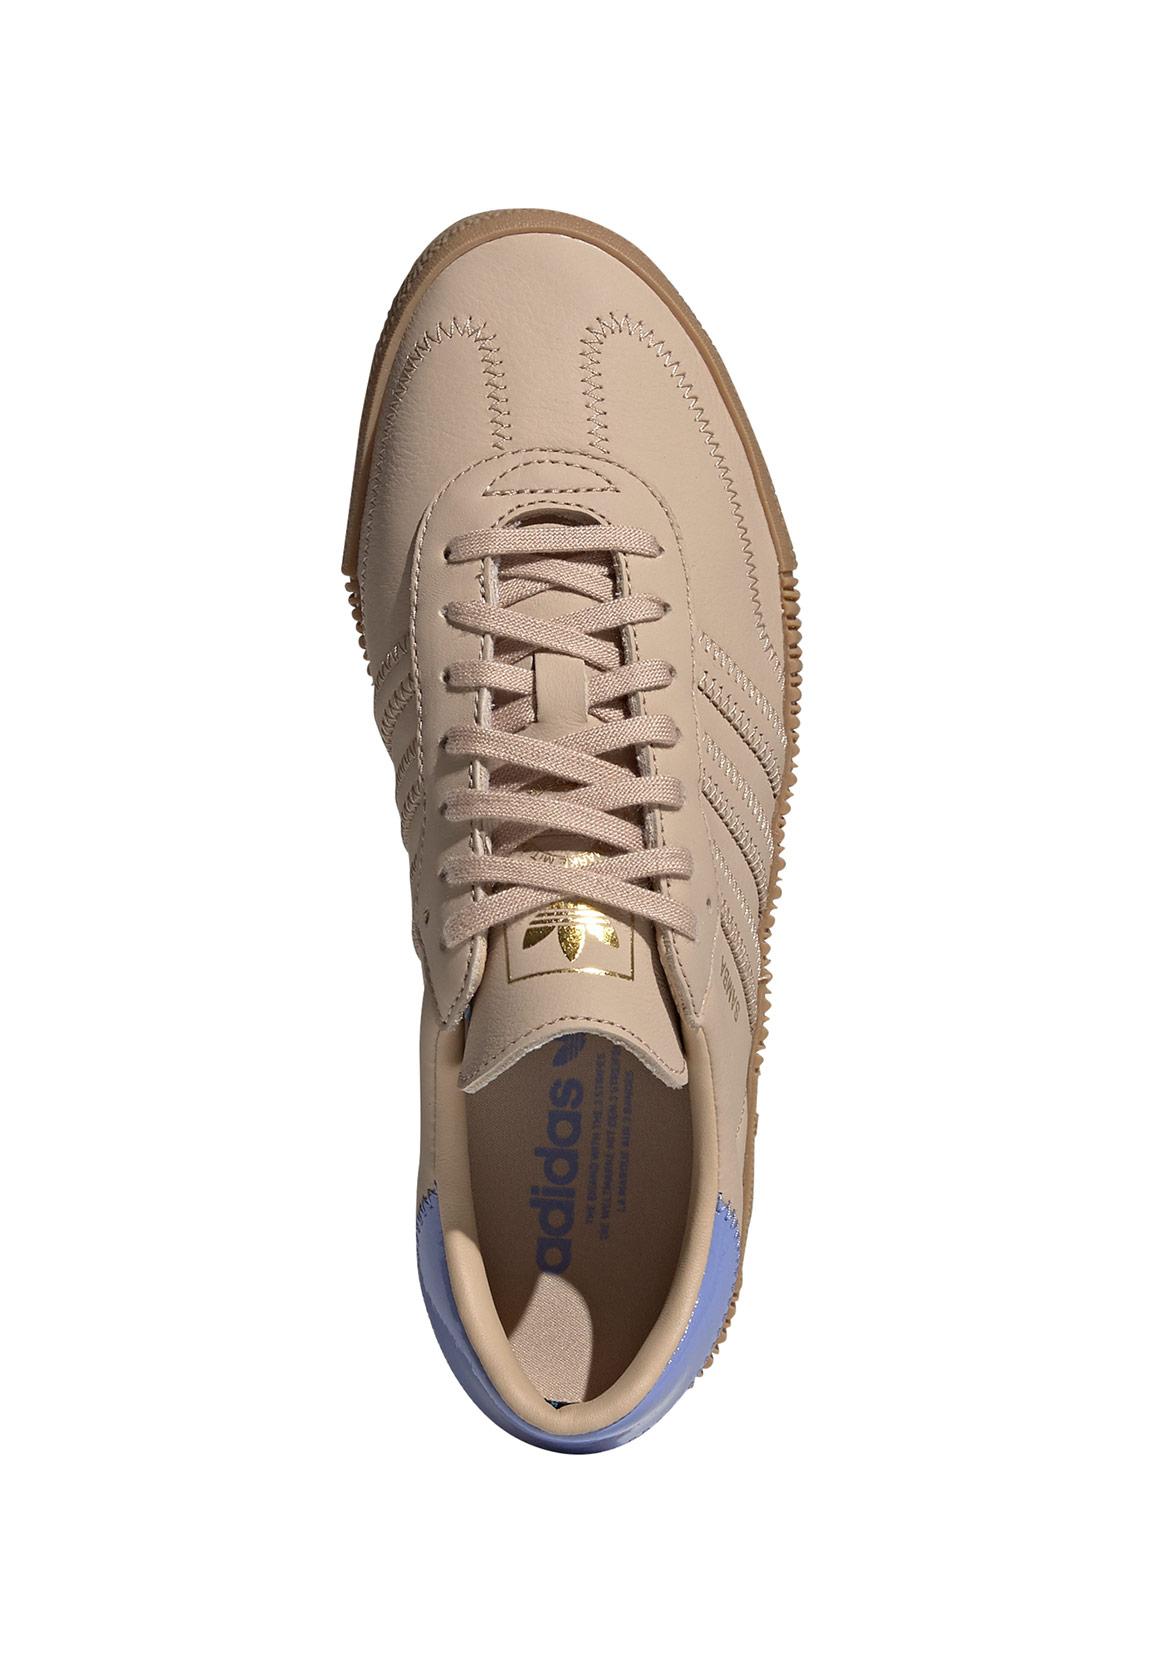 Adidas Originals Sneaker SAMBAROSE W EE7155 Braun Blau